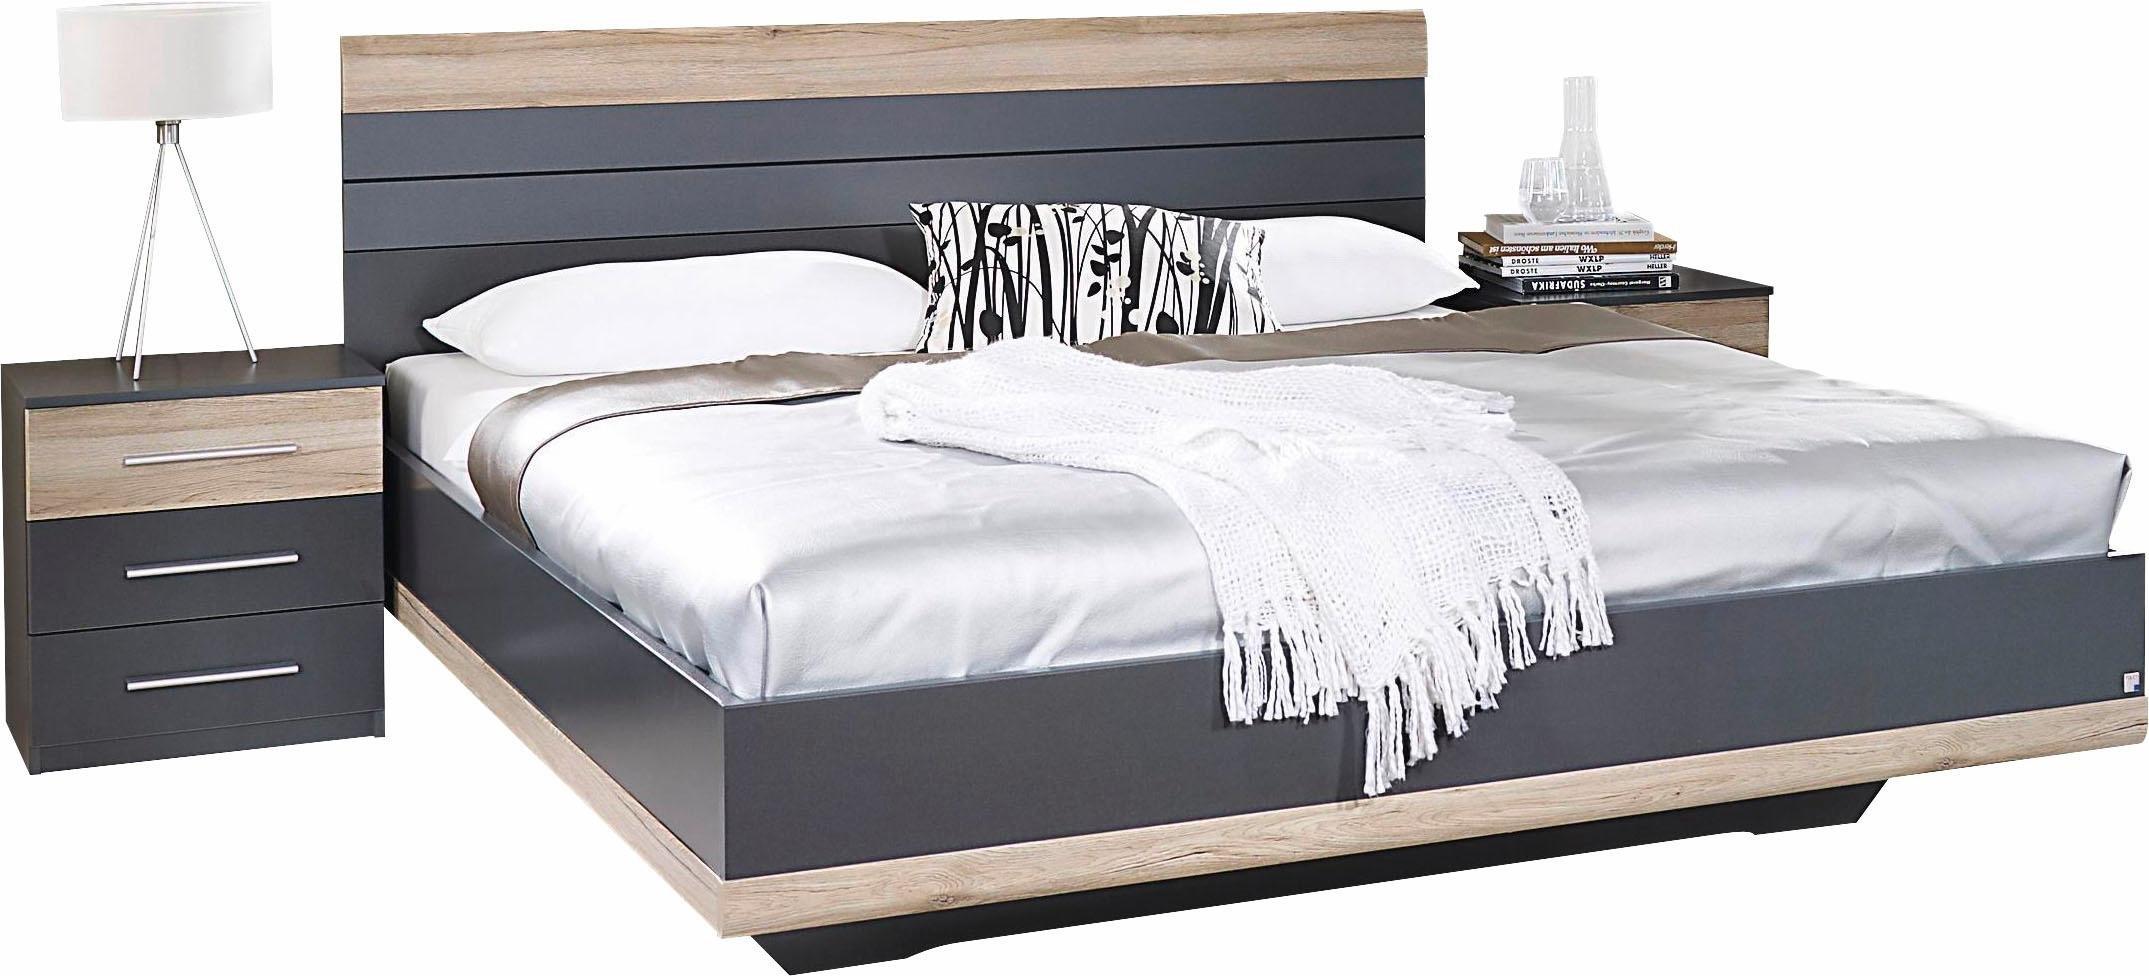 Rauch SELECT Bed Tarragona - gratis ruilen op otto.nl